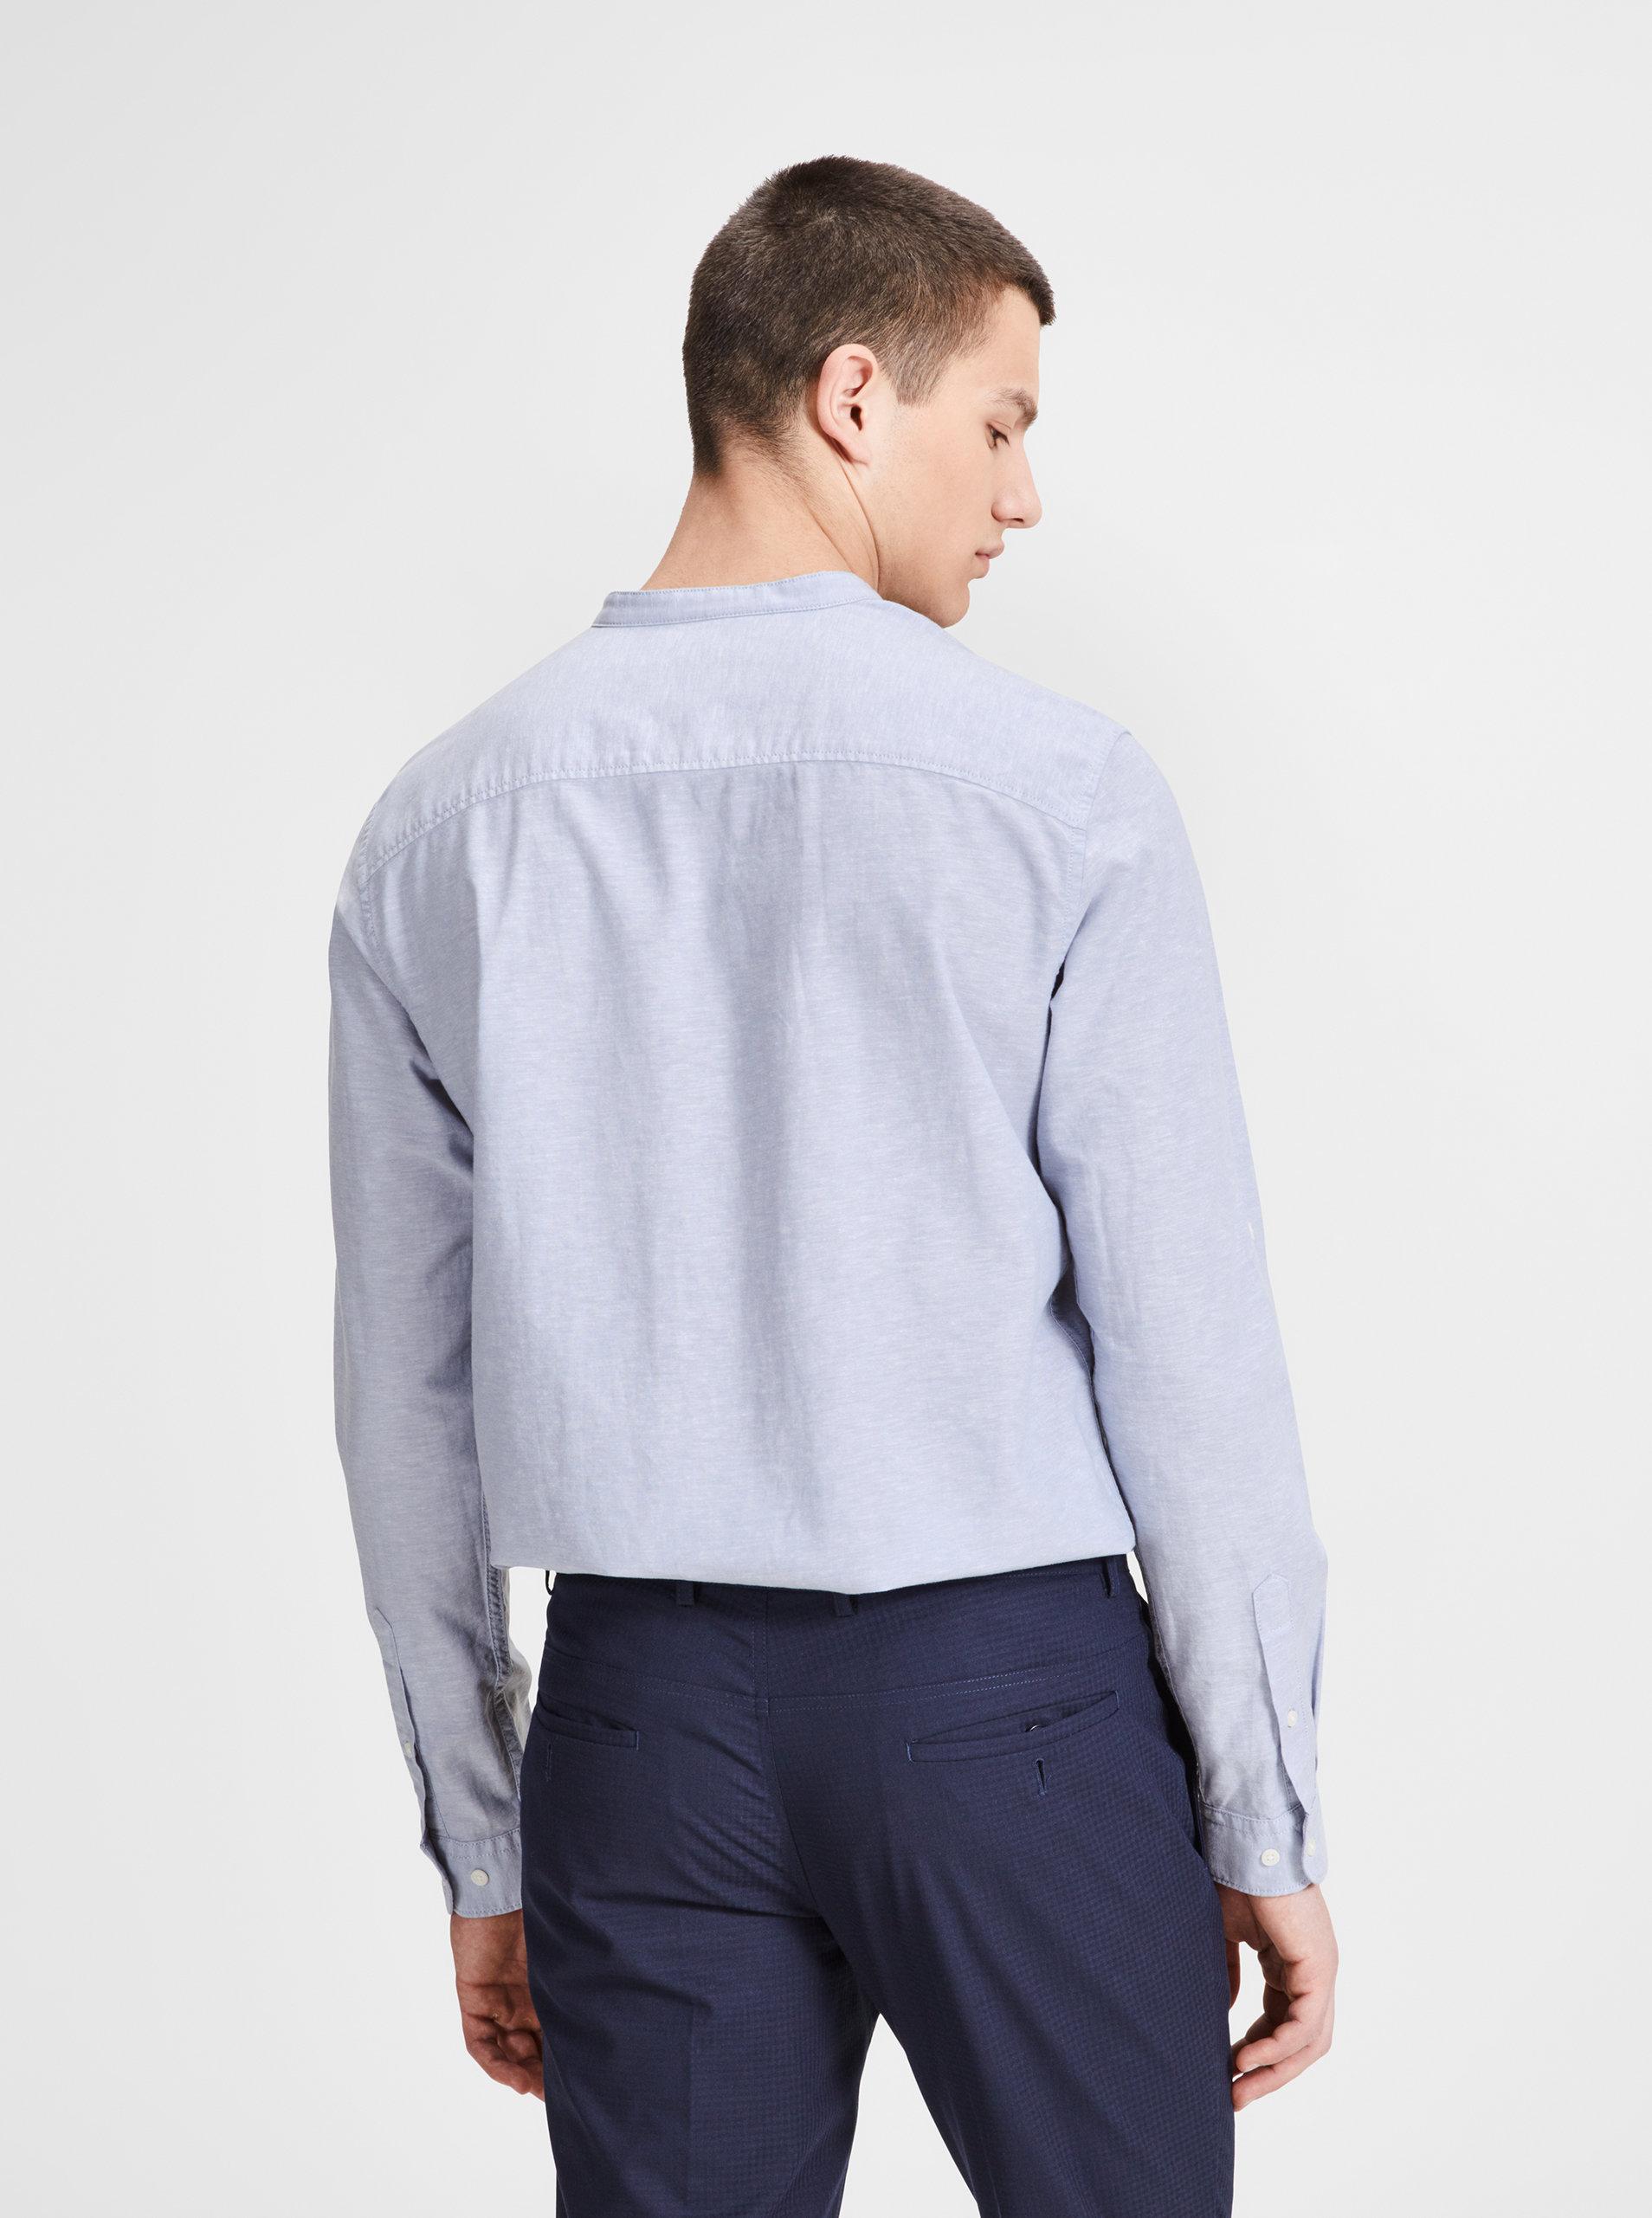 3f921c35cae9 Svetlomodrá melírovaná slim fit košeľa s prímesou ľanu Jack   Jones Premium  Summer ...